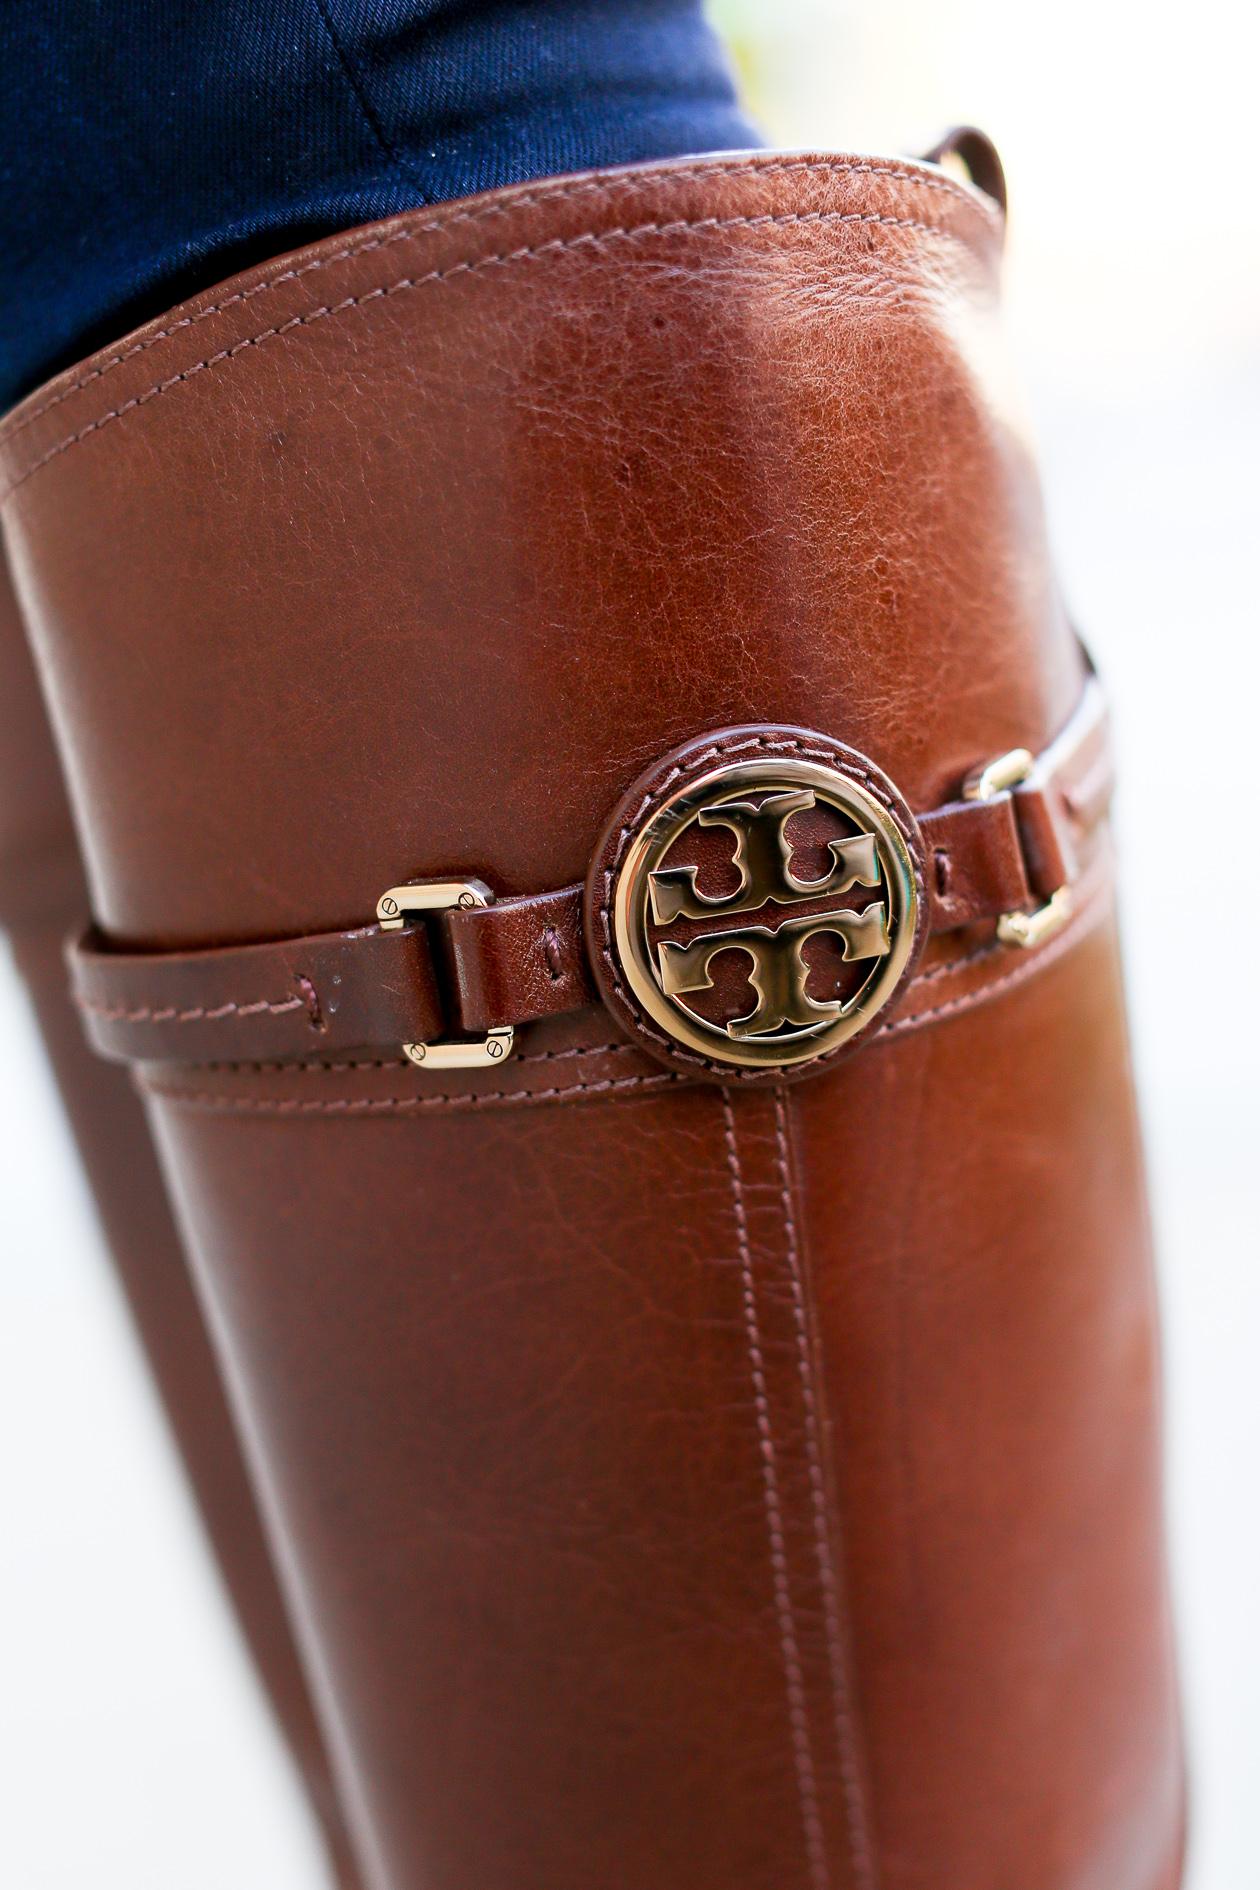 Tory Burch Light Brown Riding Boots-26